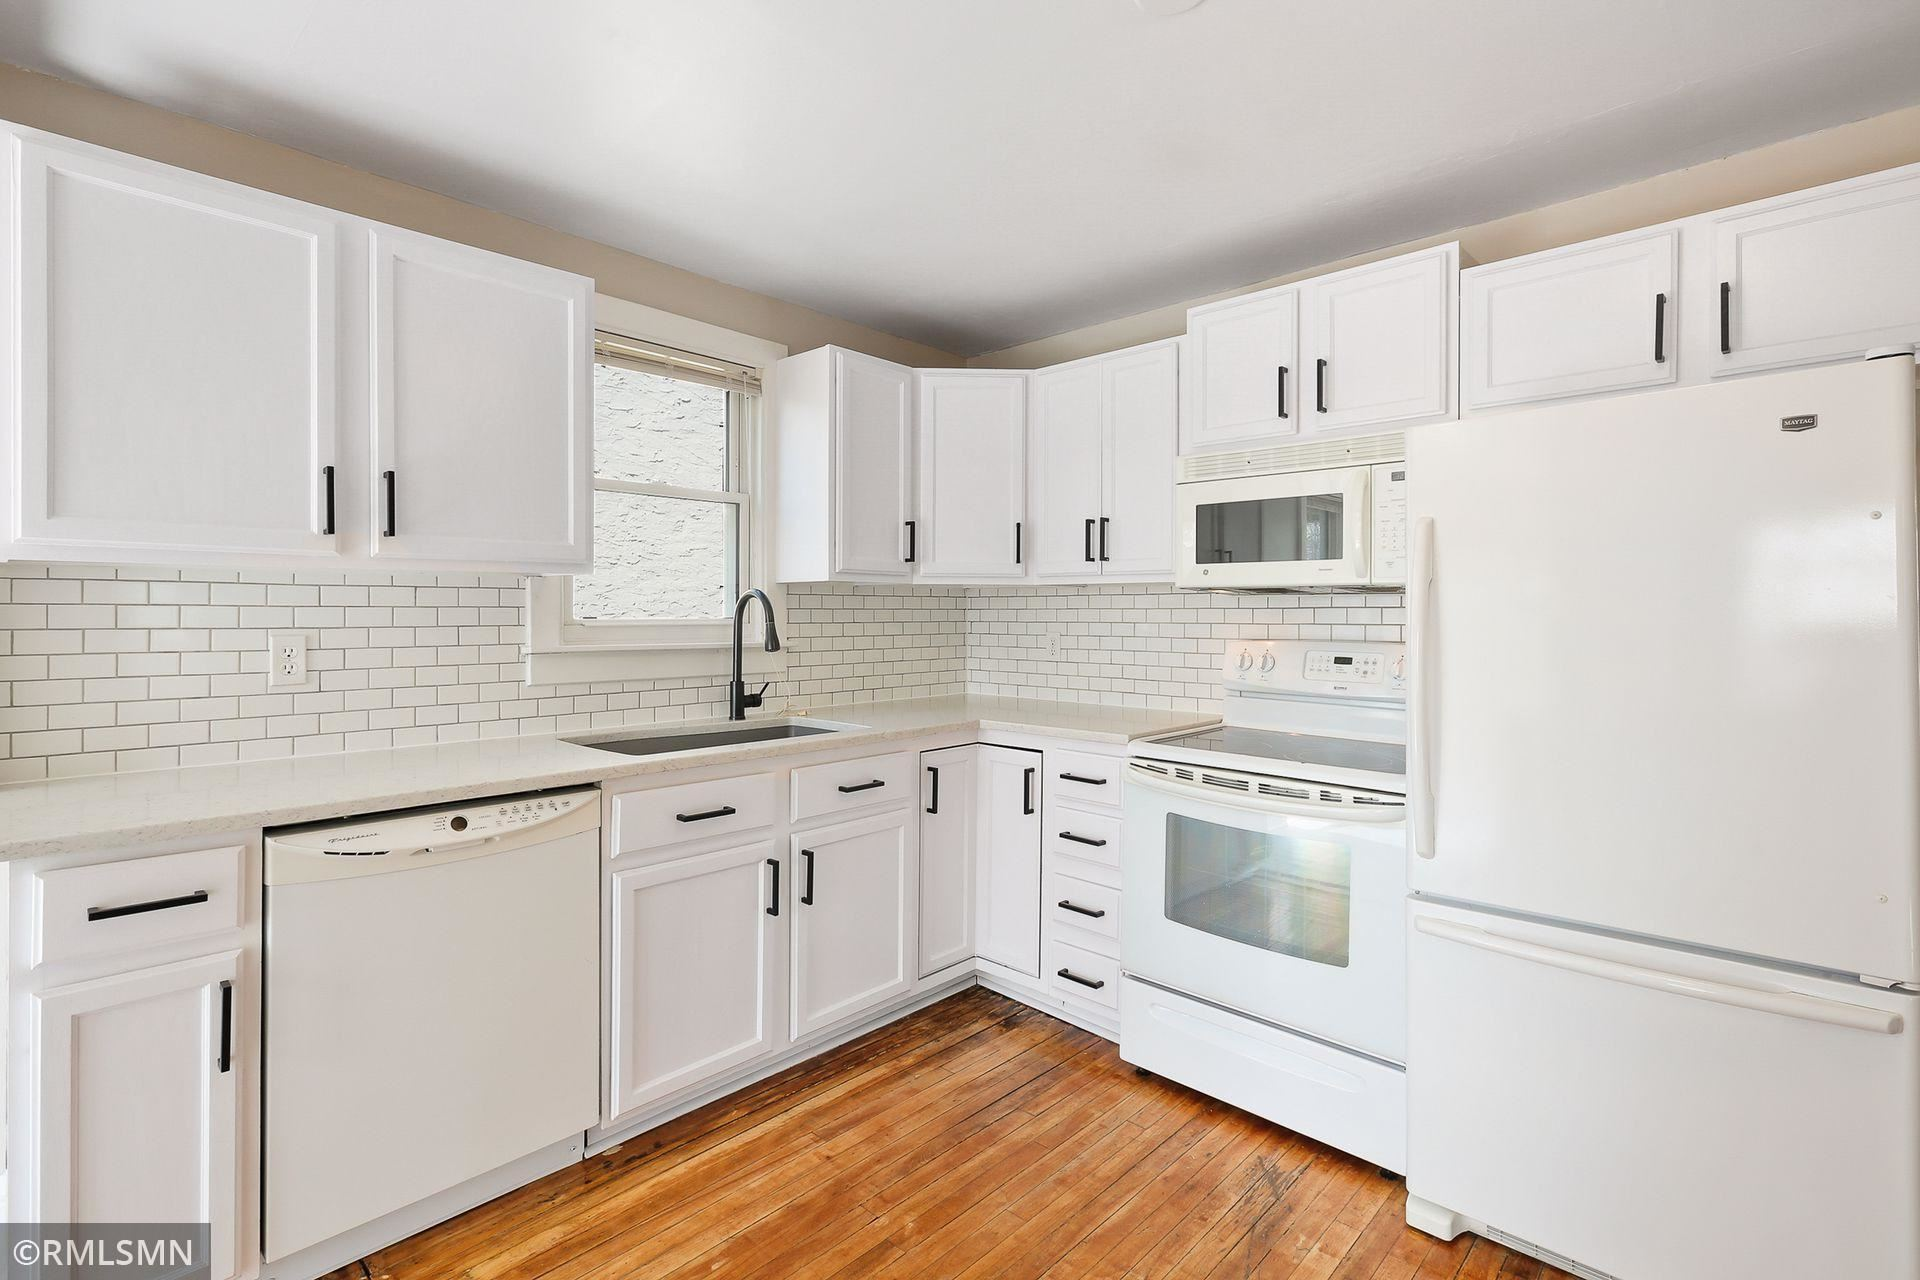 684 40th Avenue NE, Columbia Heights, MN 55421 - MLS#: 5728204